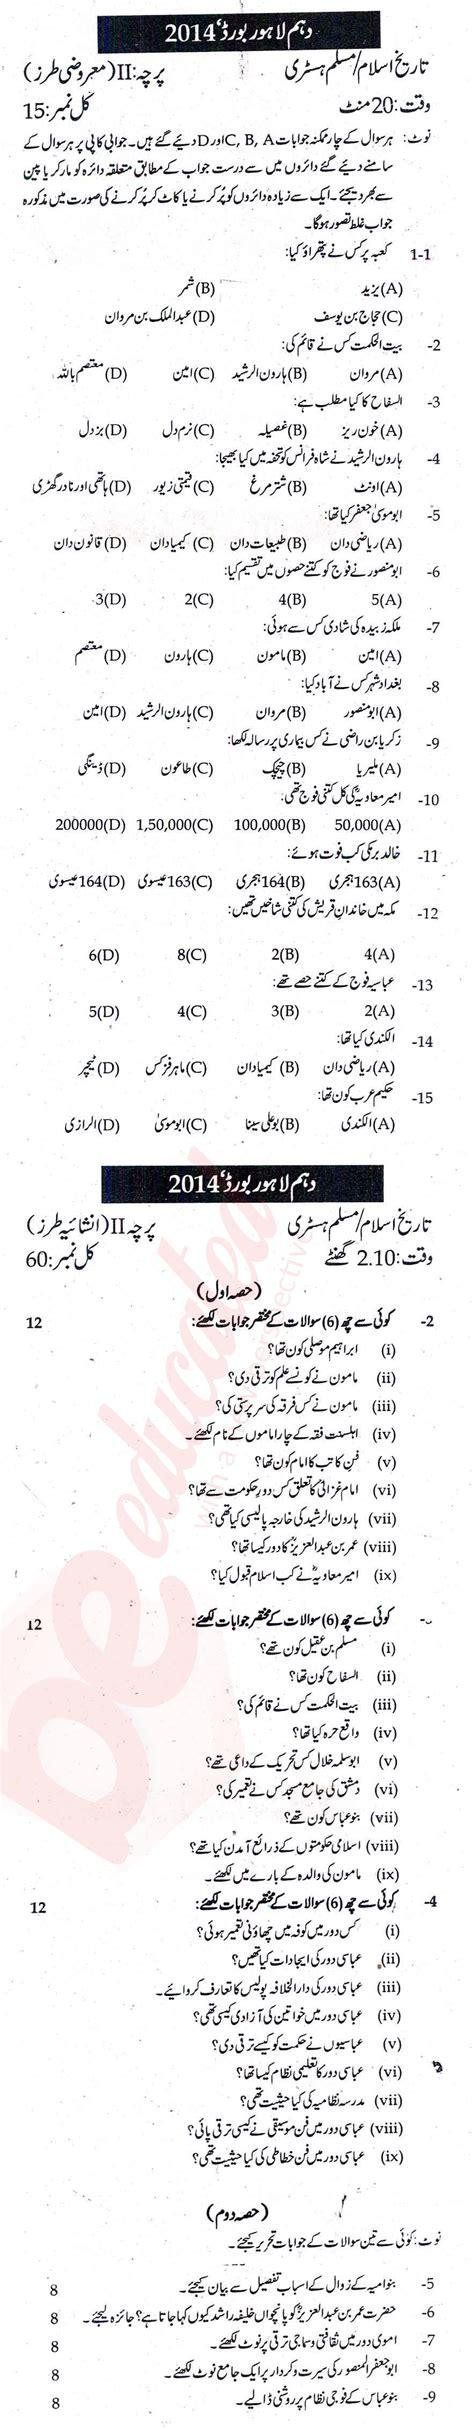 new year history in urdu islamic history subject bise lahore 10th class urdu medium